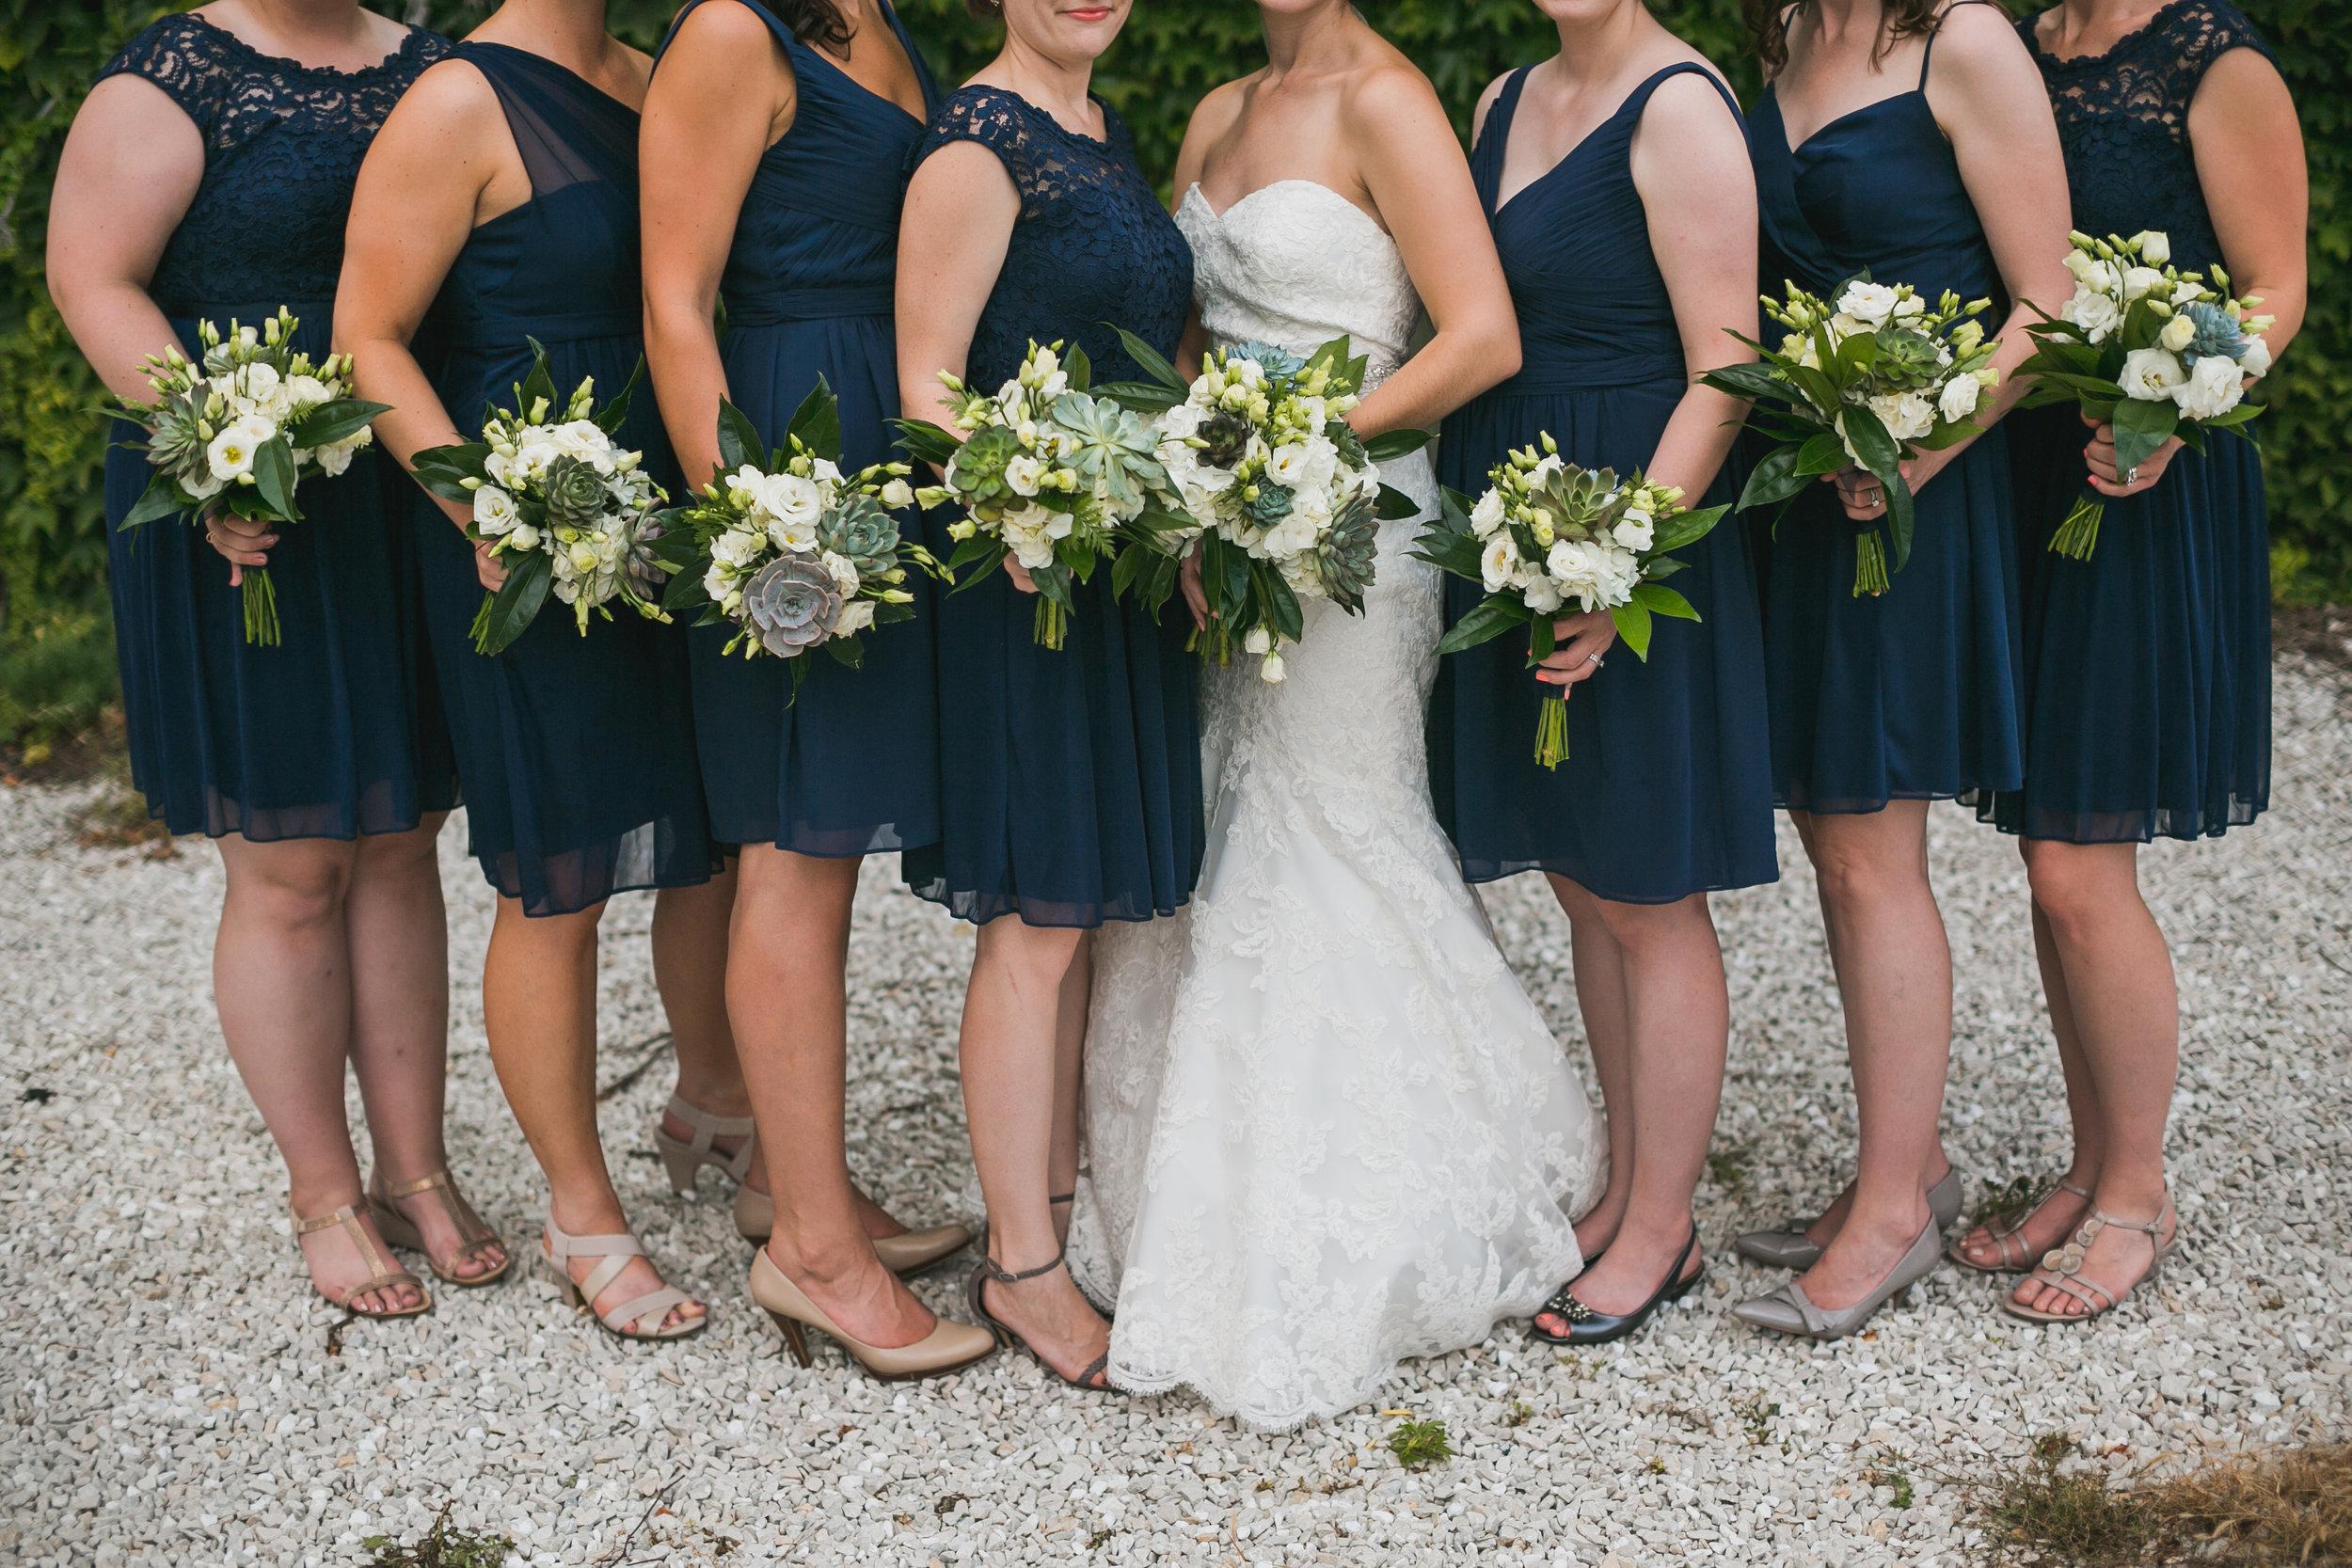 wisconsin-wedding-acowsay-uttke-photography-32.jpg